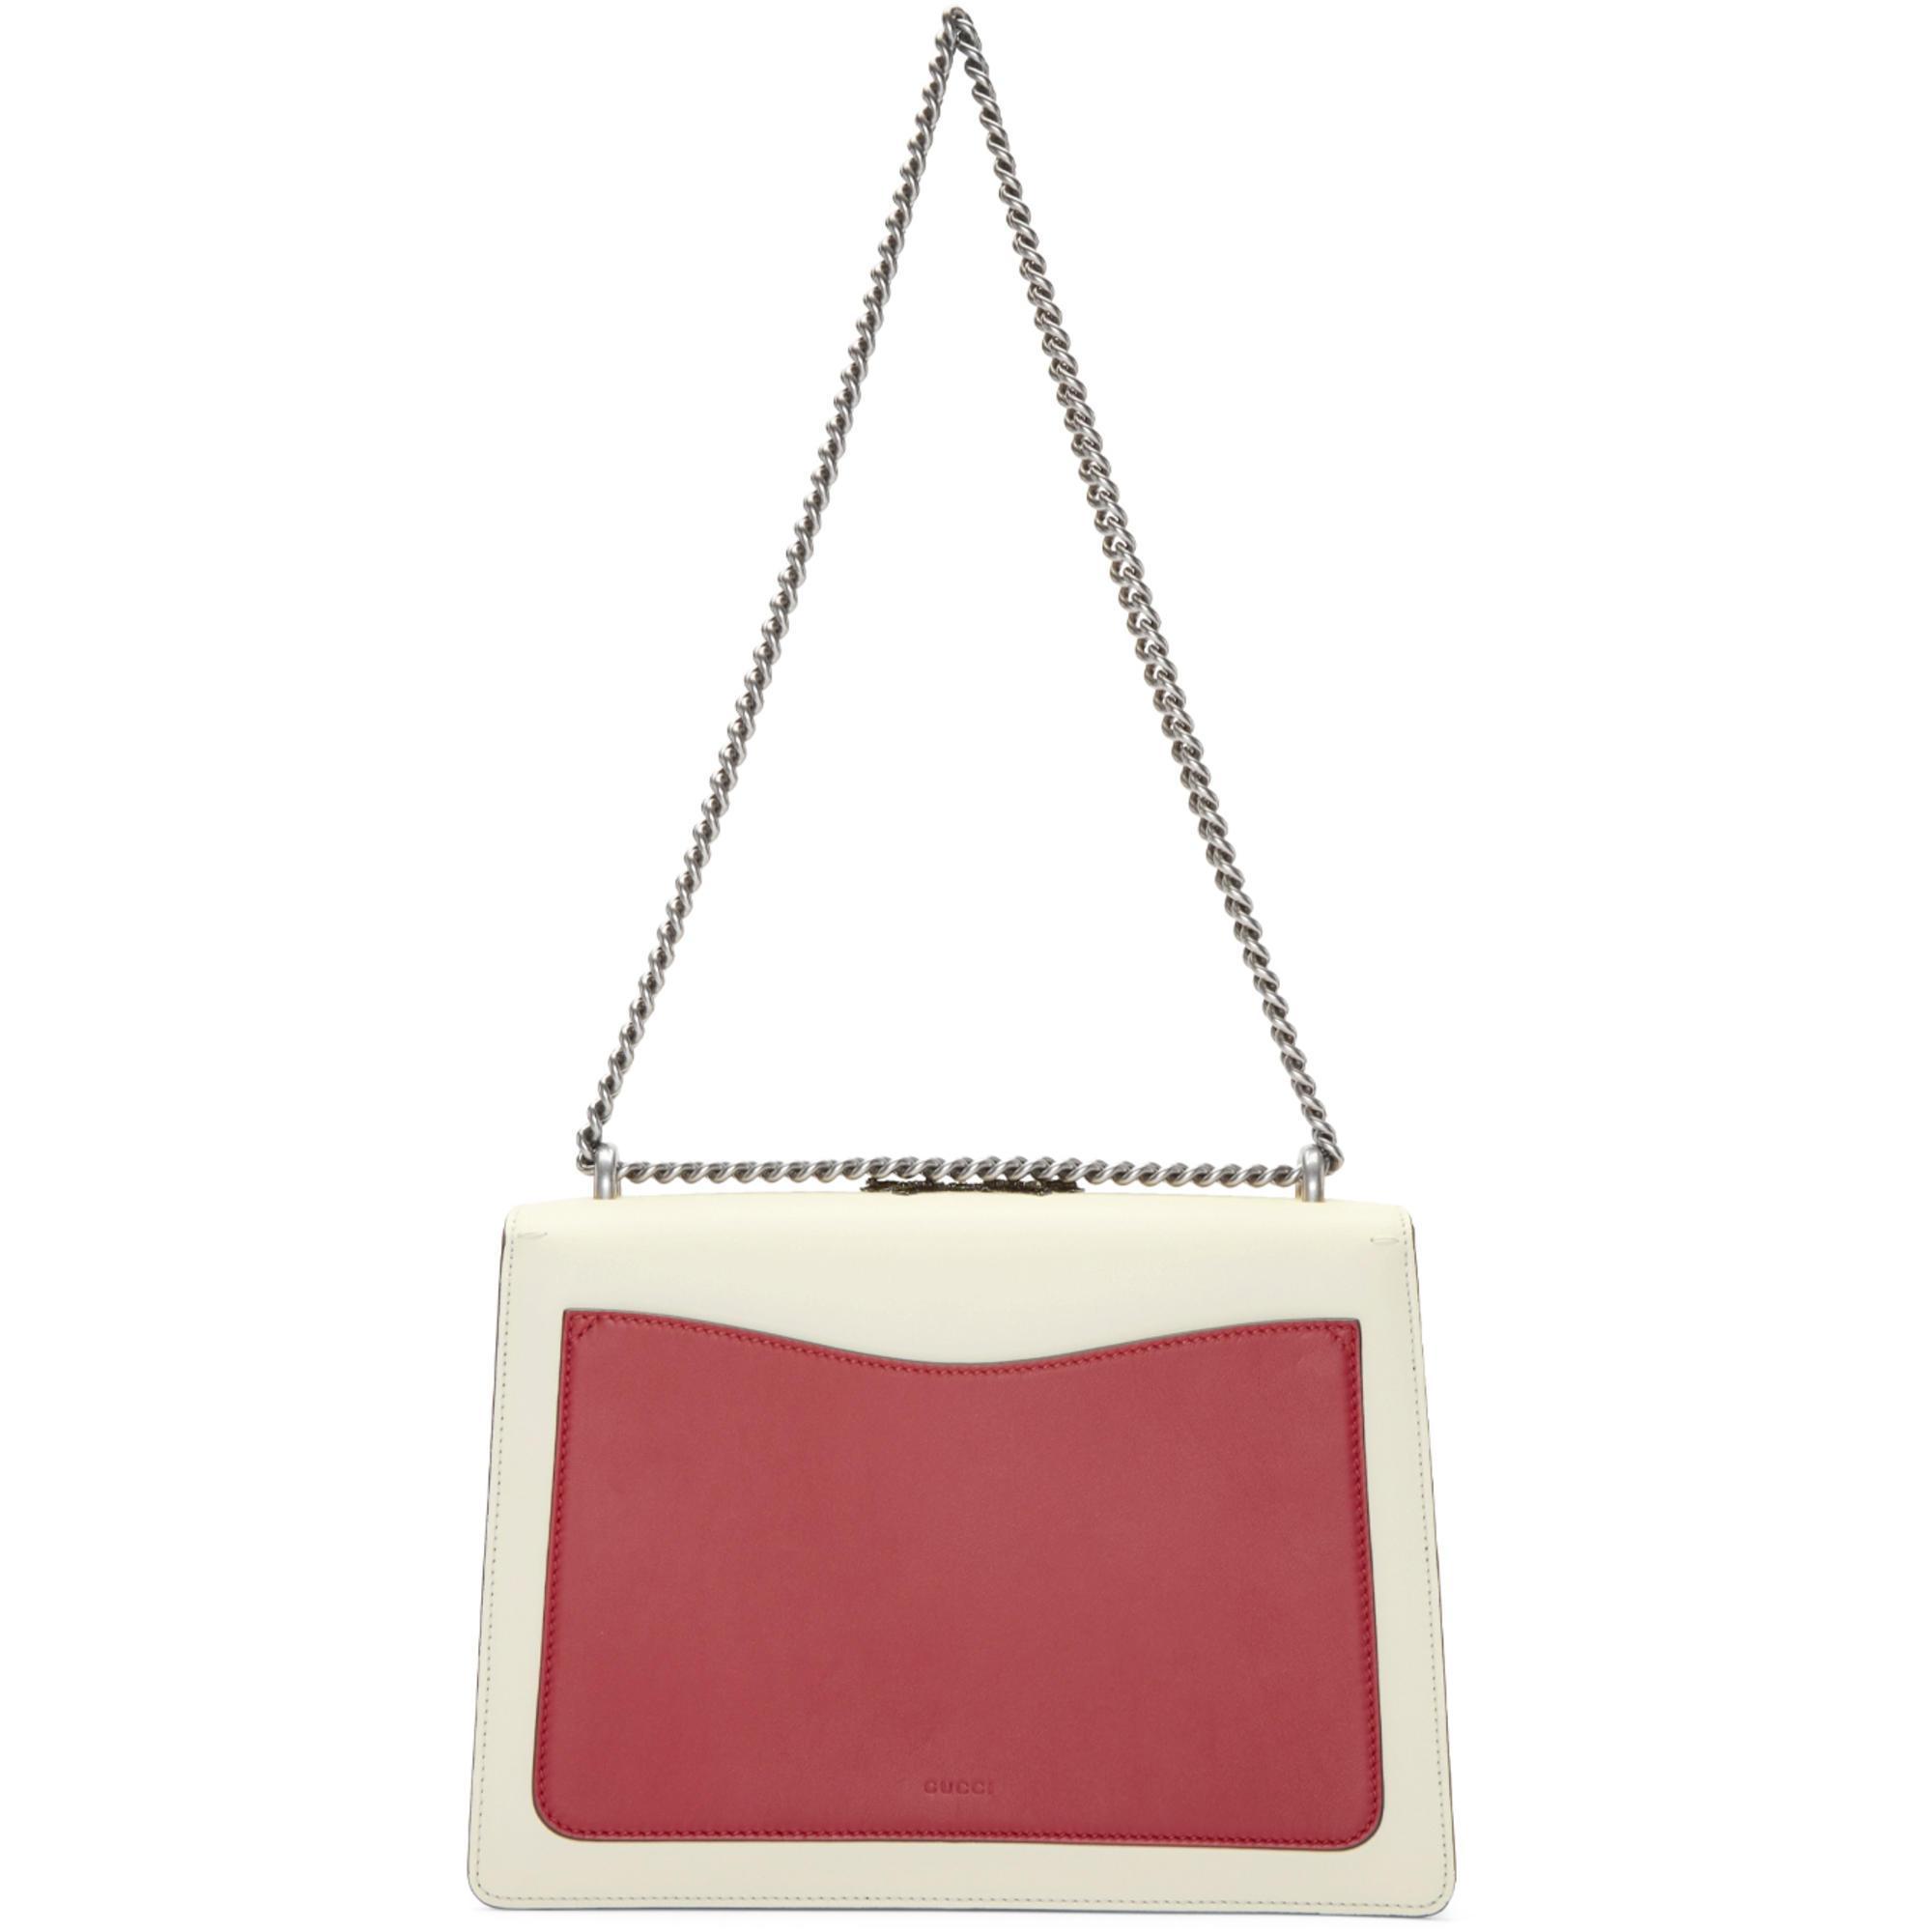 580c6d4da5f Lyst - Gucci Multicolor Large Dionysus Bag